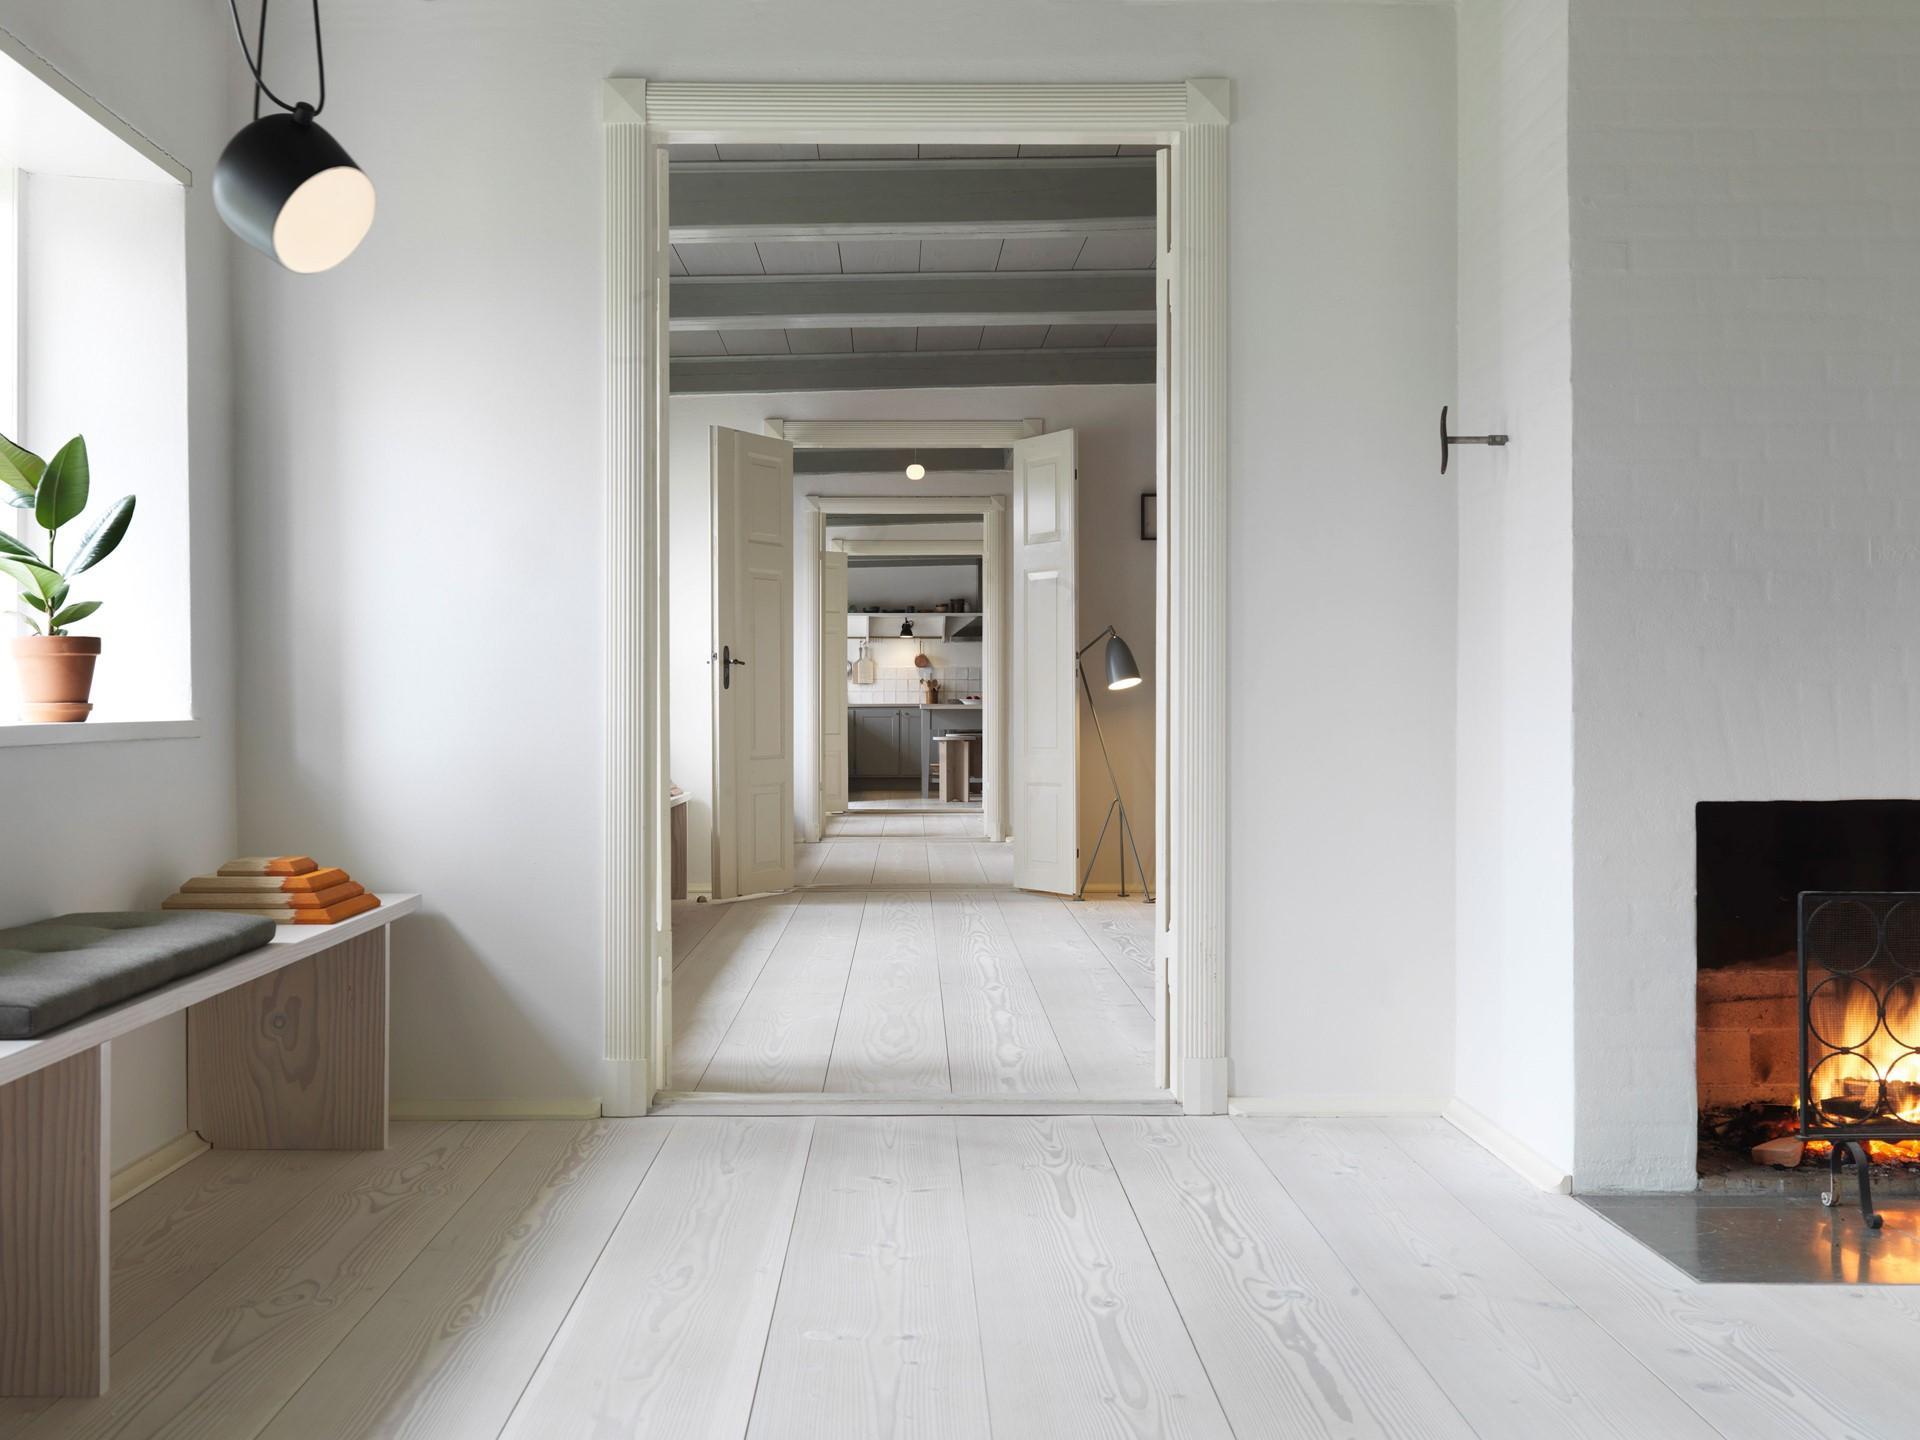 douglas fir floor lye white soap underfloor heating hallway dinesen country home_02.jpg